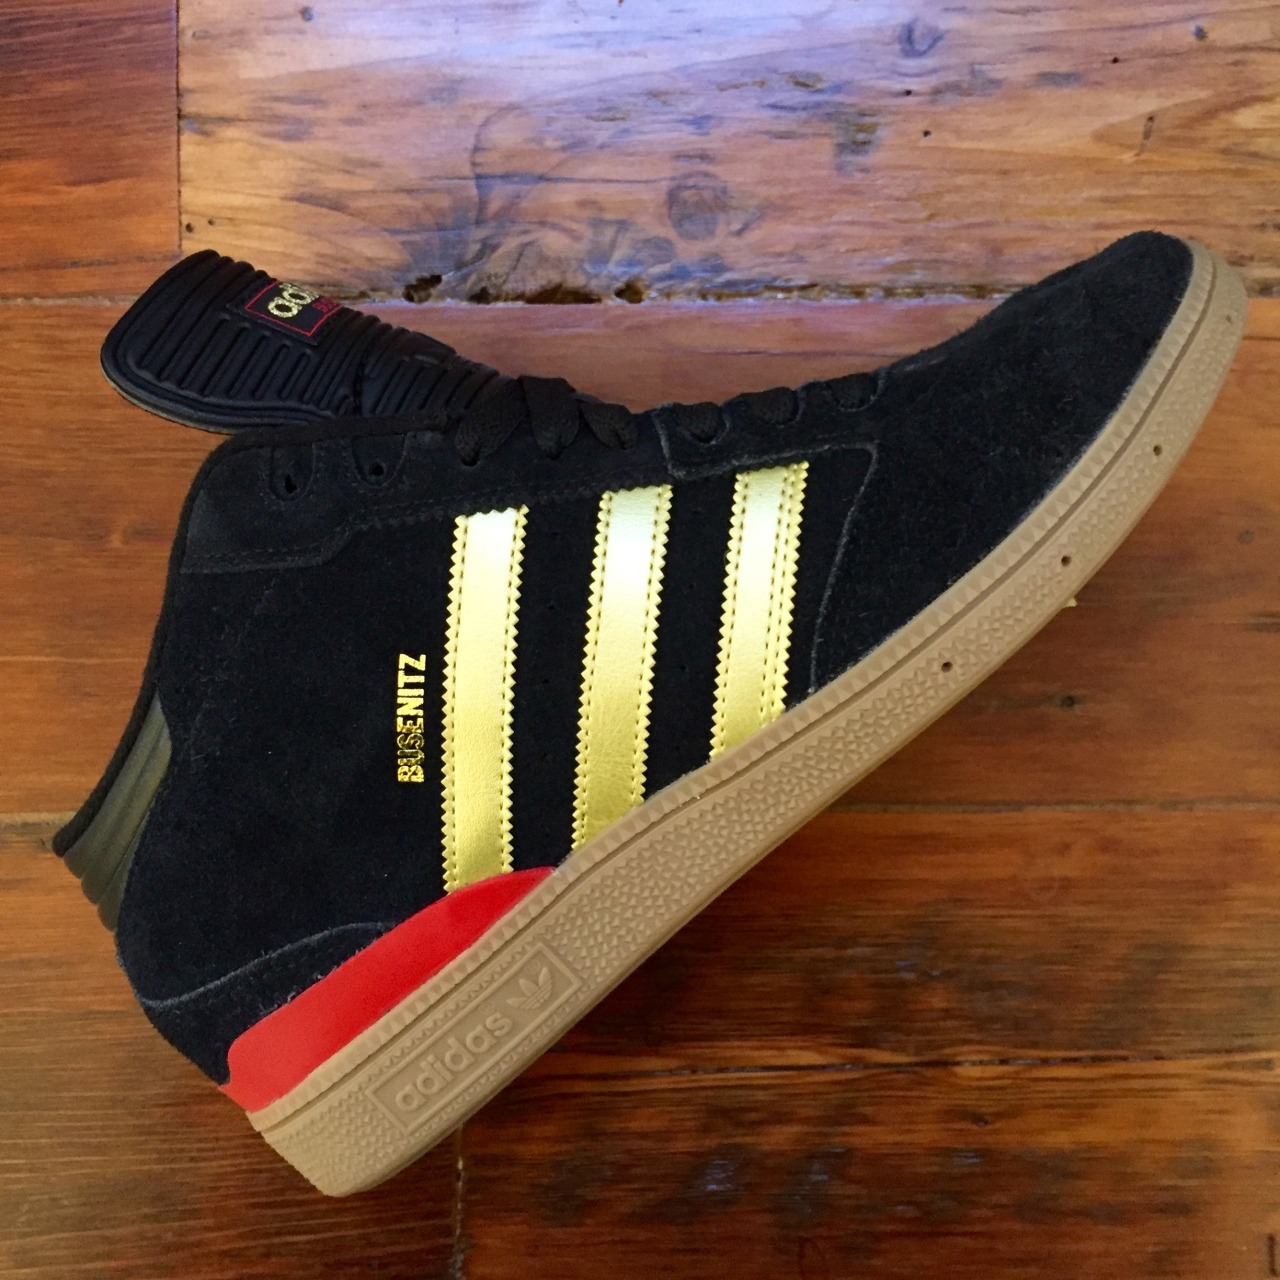 Adidas busenitz mid